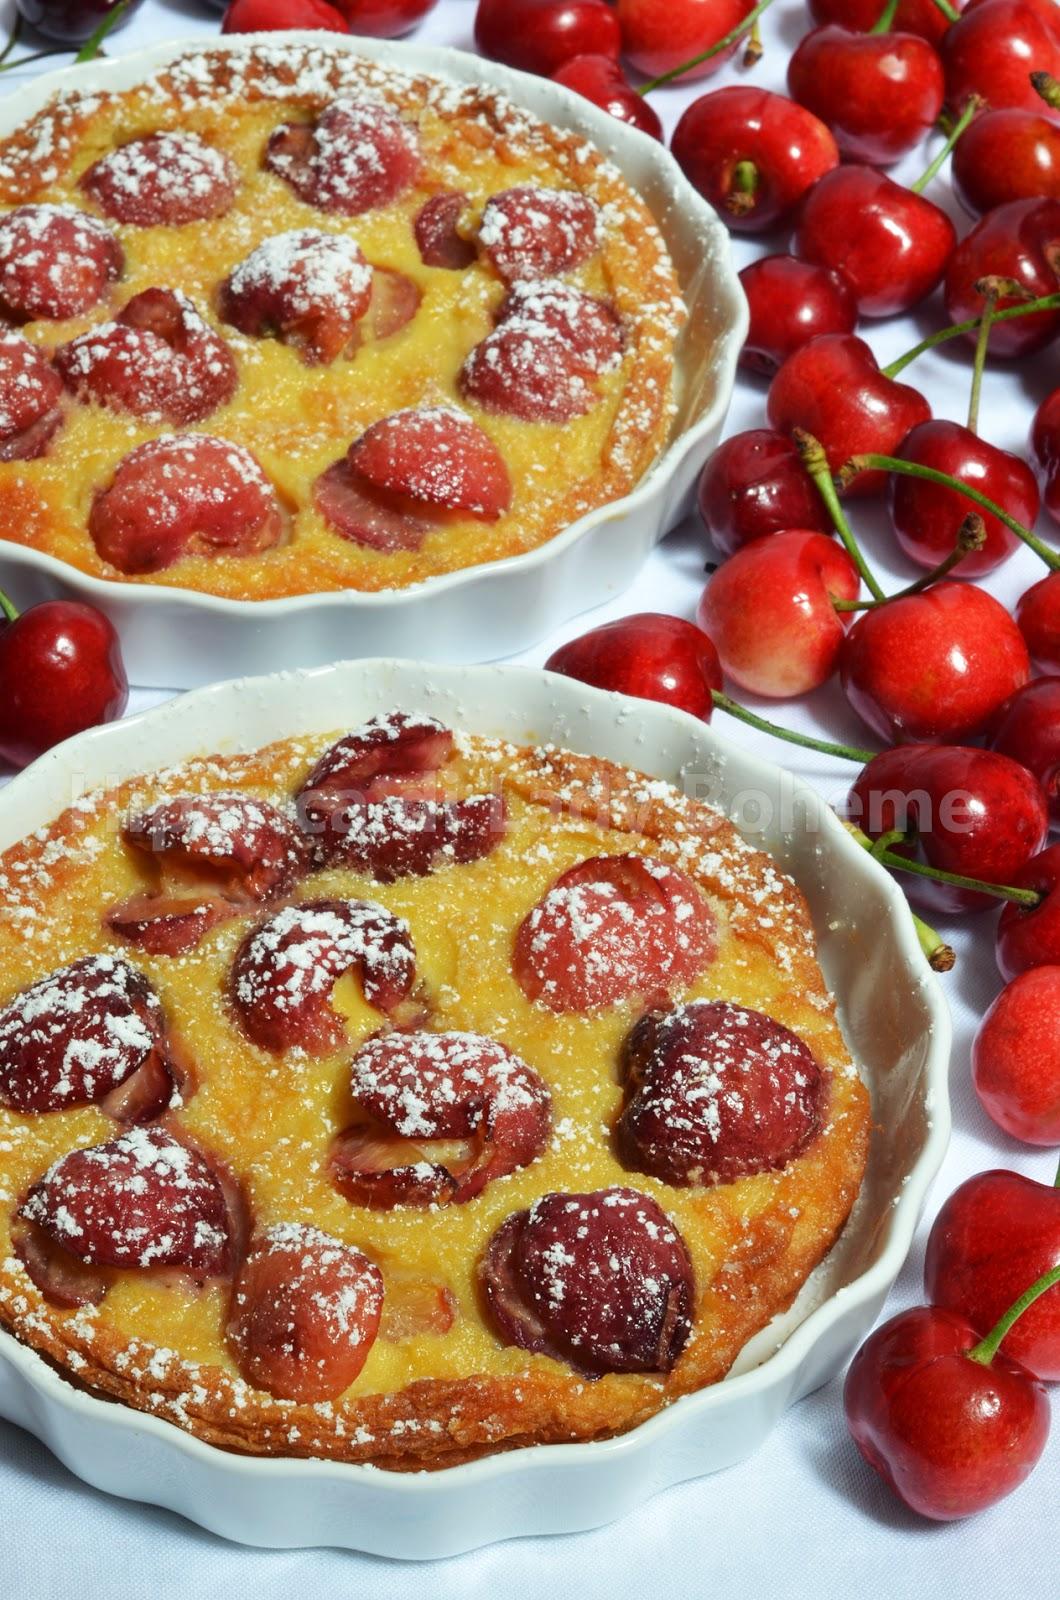 hiperica_lady_boheme_blog_di_cucina_ricette_gustose_facili_veloci_clafoutis_alle_ciliegie_2